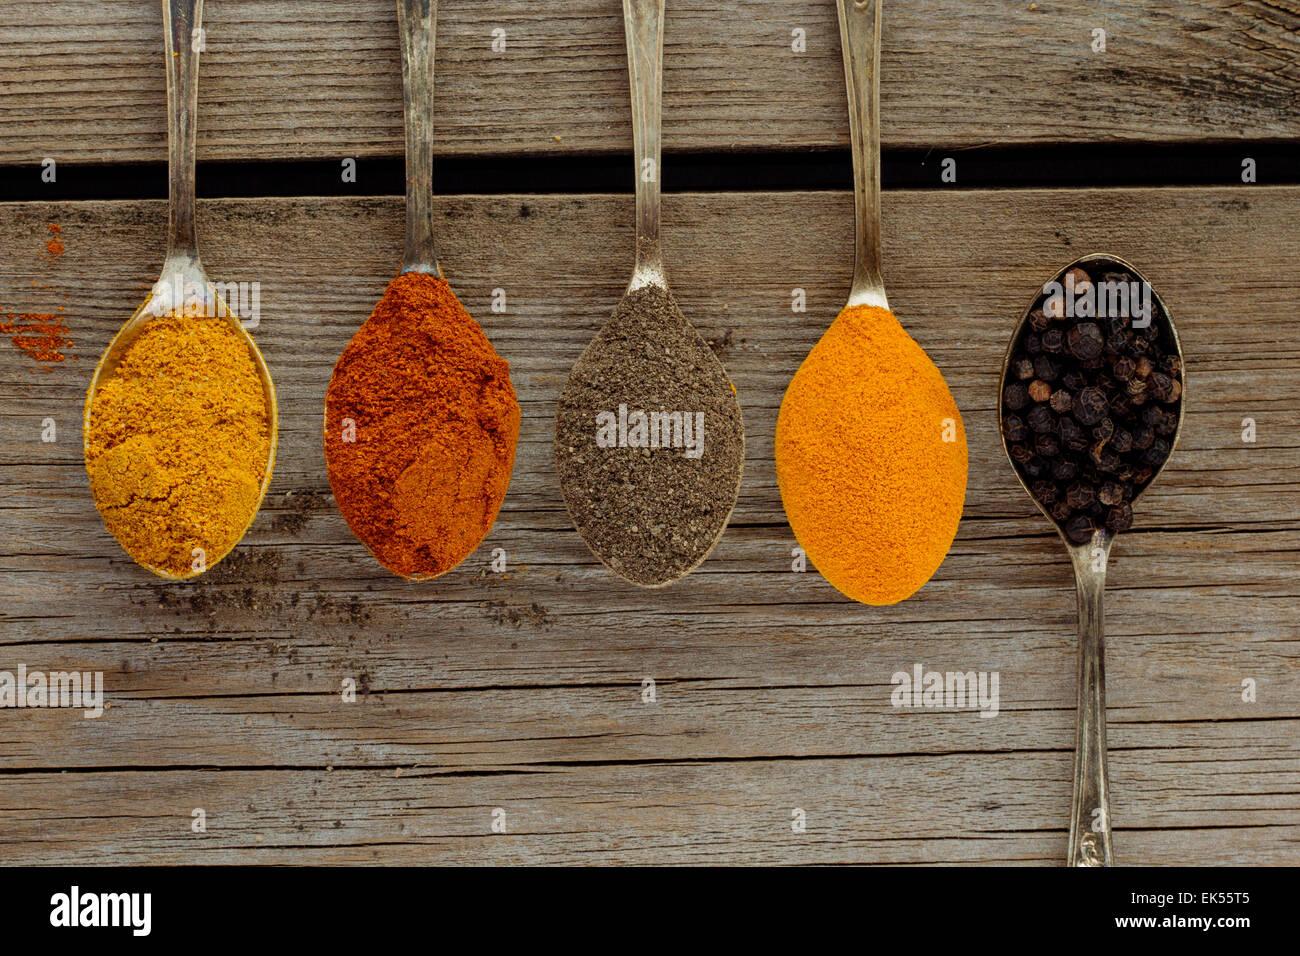 Curry, nero e peperoni rossi, Peppe e curcuma su cucchiai vista superiore Immagini Stock